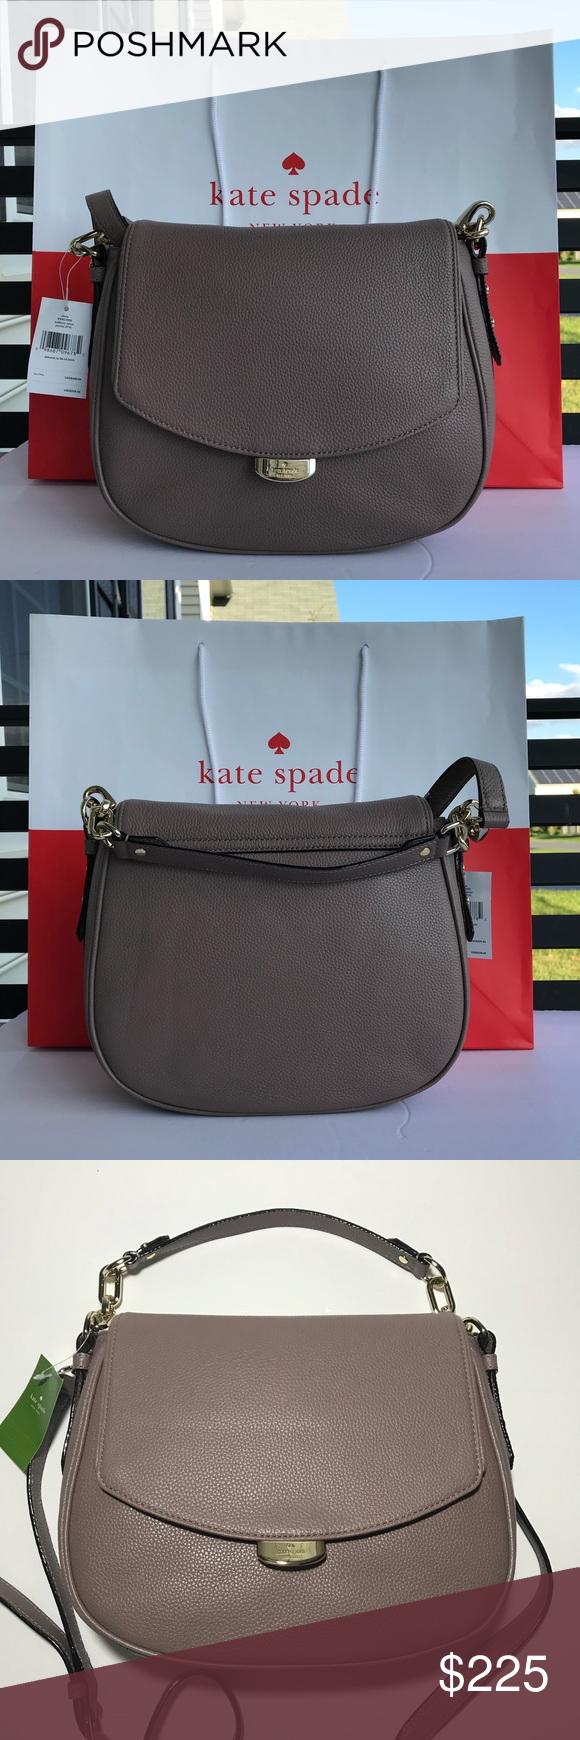 4121f9036d34 Nwt Kate Spade Alecia Mulberry Street Porcini New